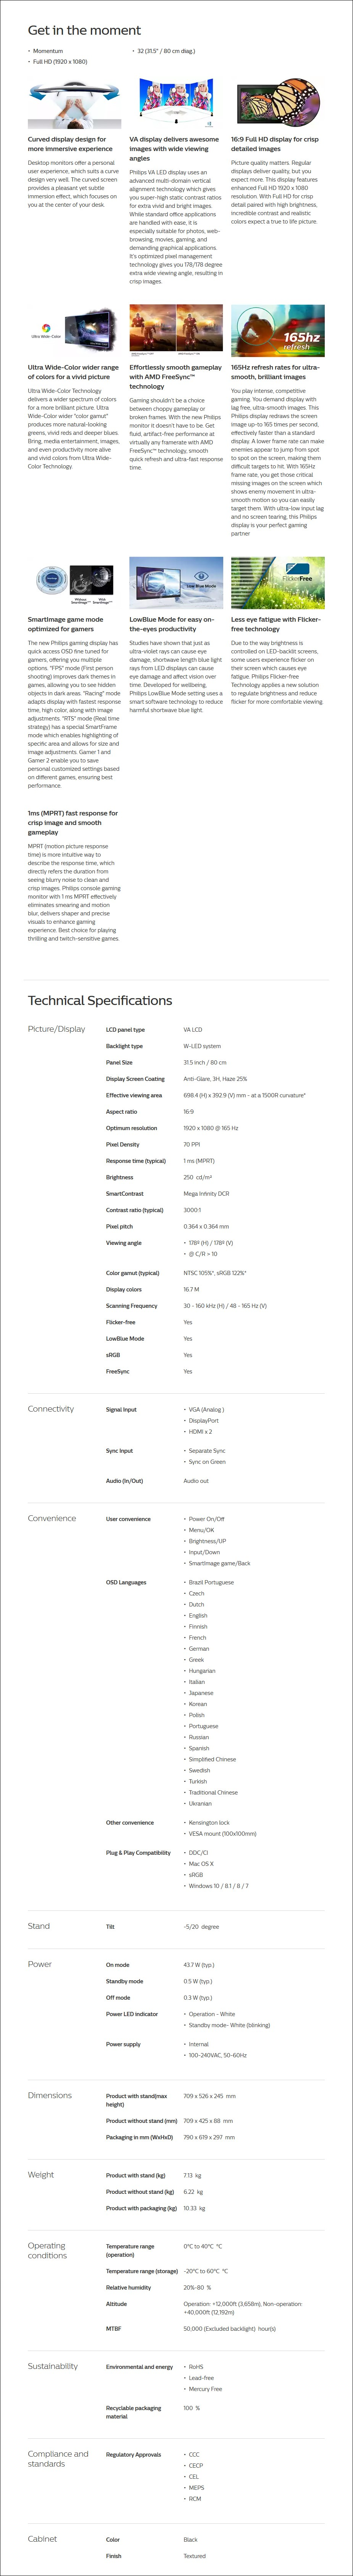 philips-322m8cz-32-165hz-full-hd-1ms-curved-freesync-gaming-monitor-ac32998-7.jpg